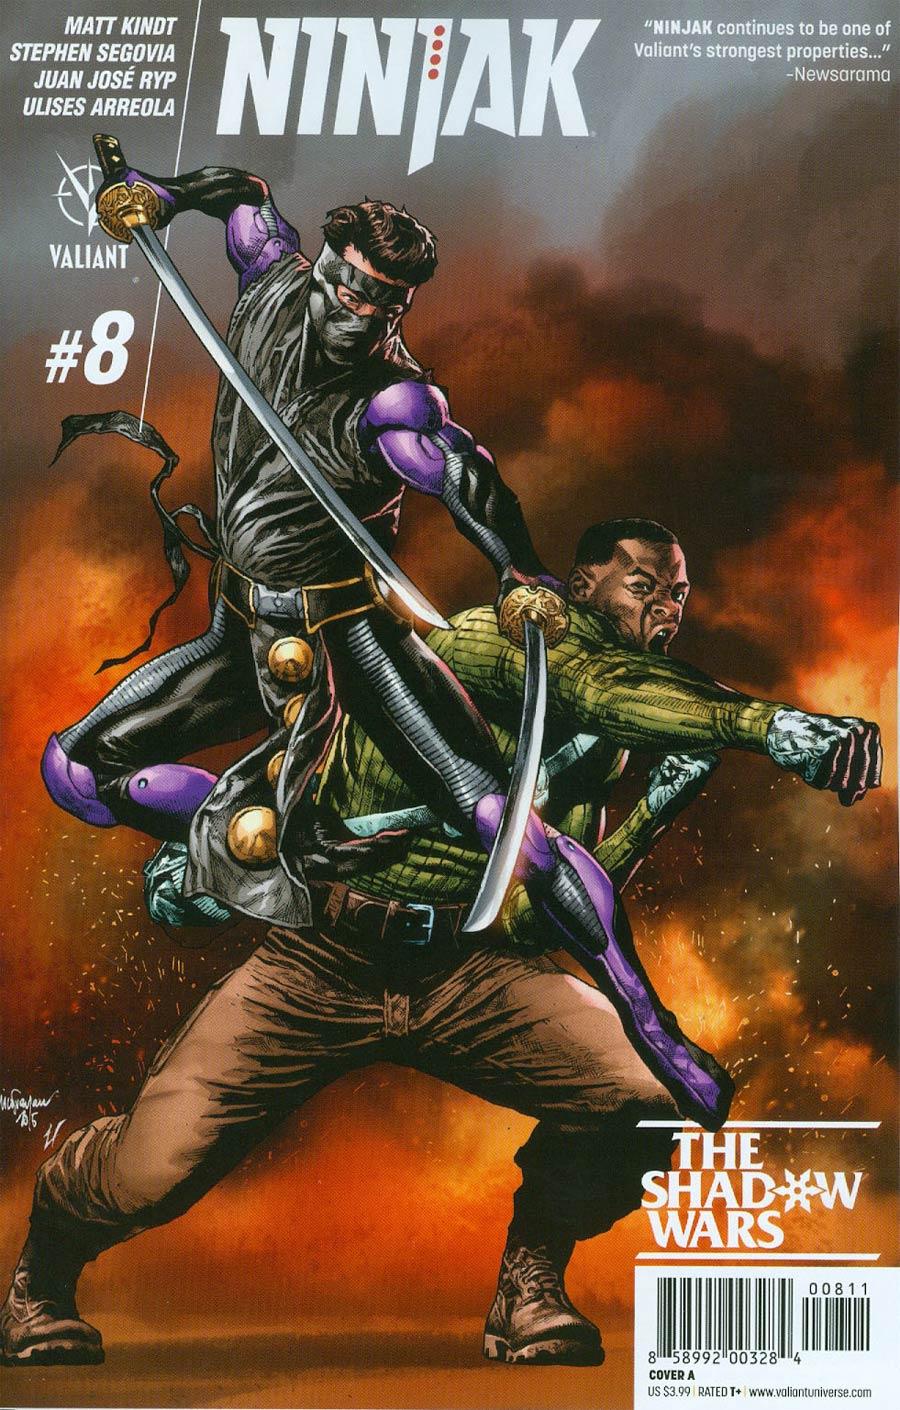 Ninjak Vol 3 #8 Cover A Regular Mico Suayan Cover